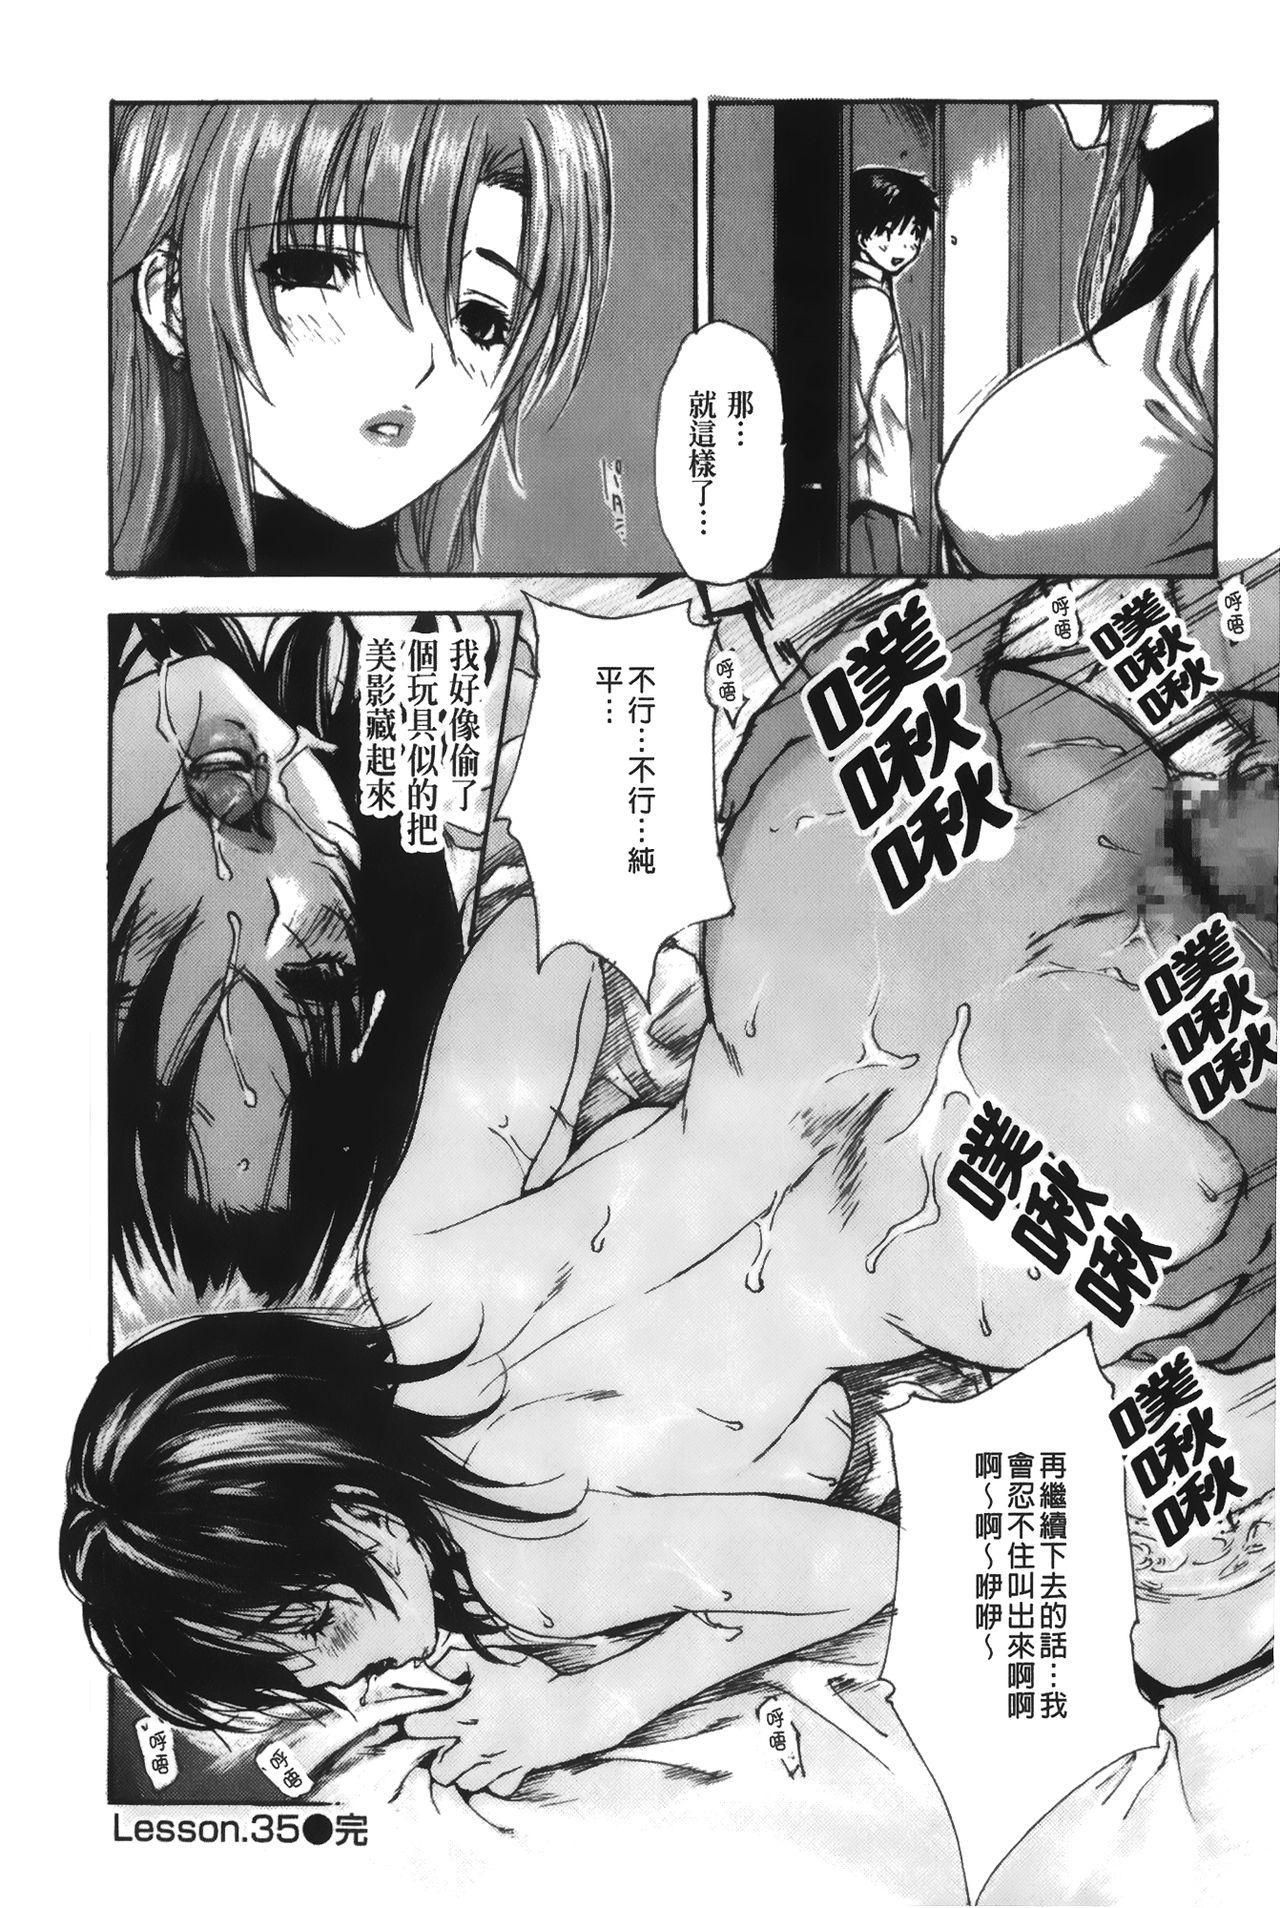 Tonari no Minano Sensei 4 | 隔壁的美奈乃老師 4 103